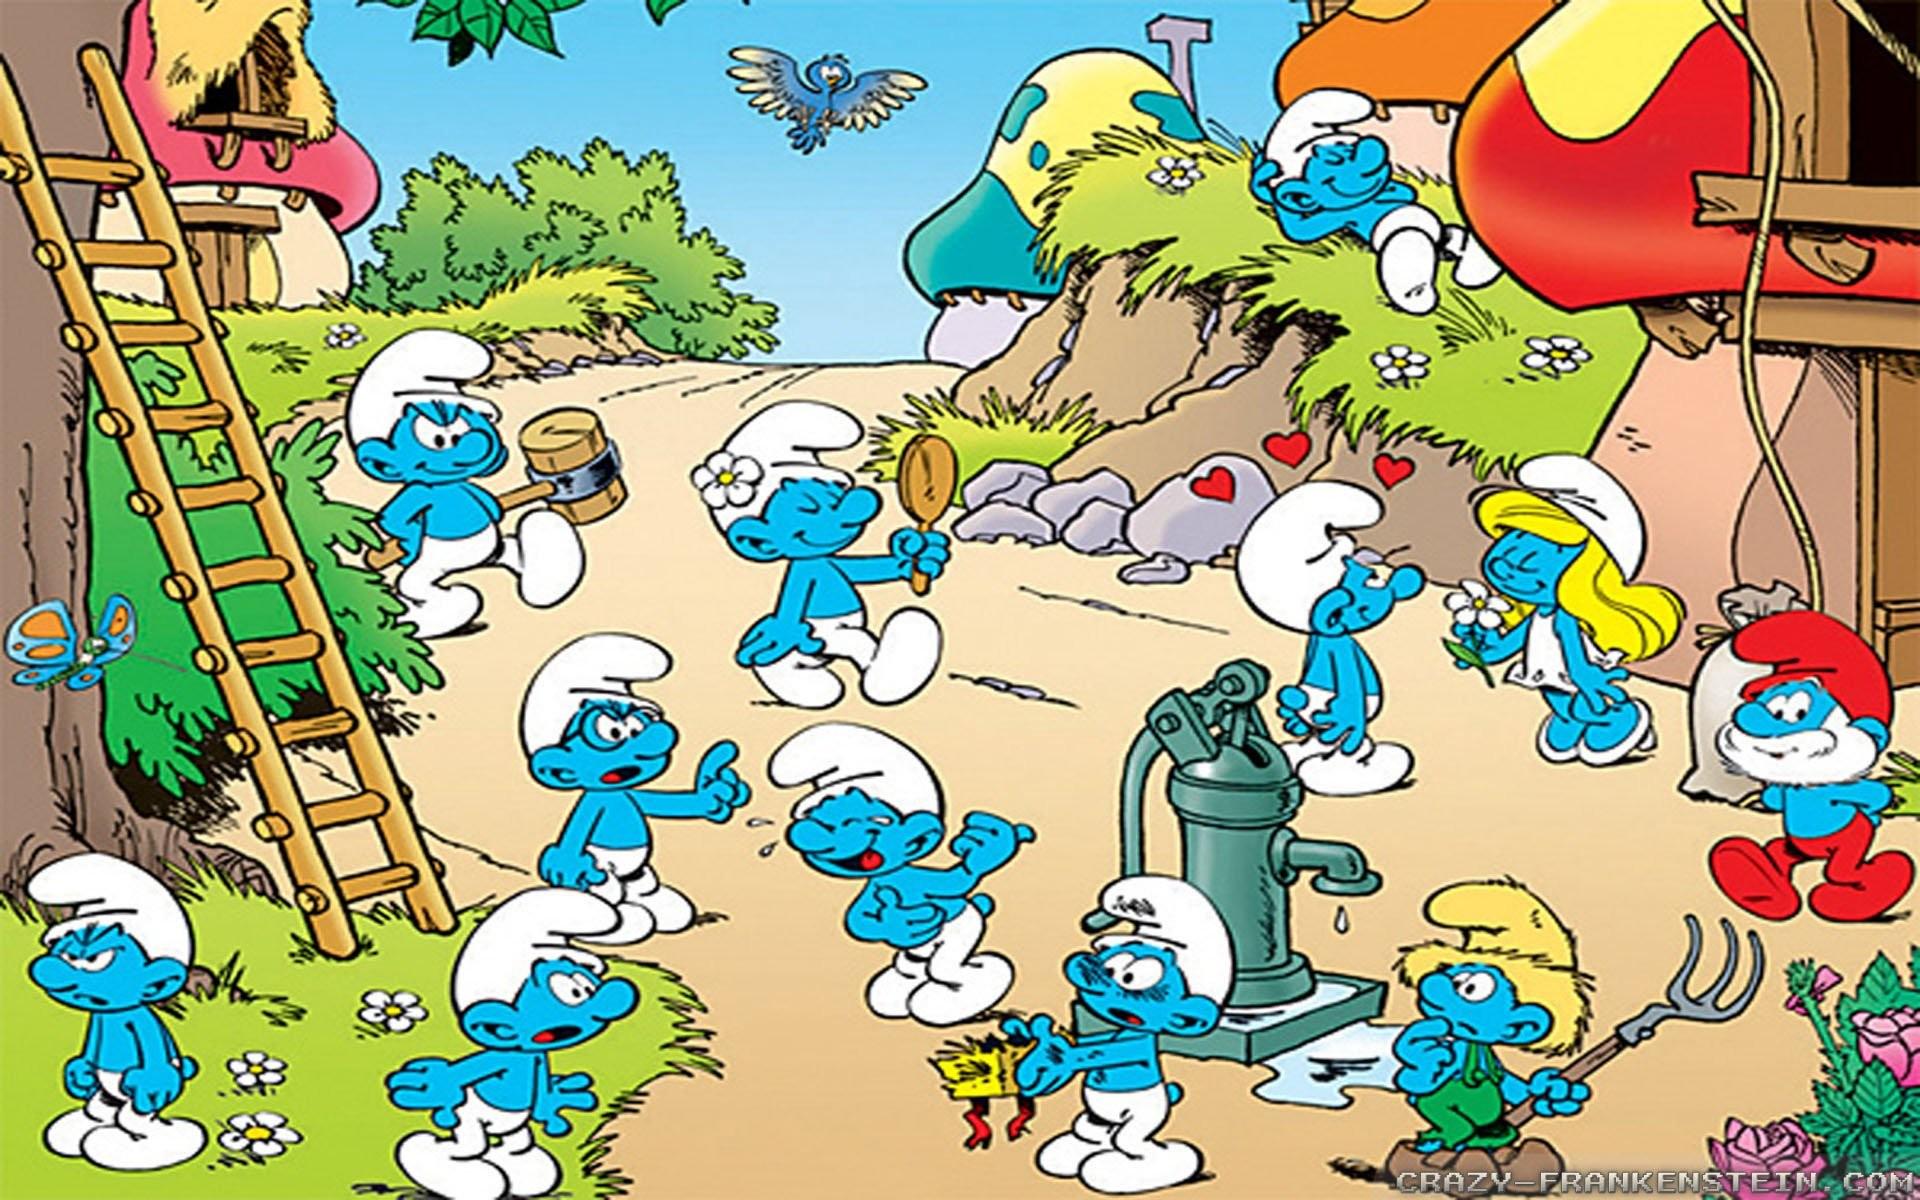 The-Smurfs-Cartoon-Wallpapers-2.jpg (1920×1200) | el 17 anata ga naritai  monodesu | Pinterest